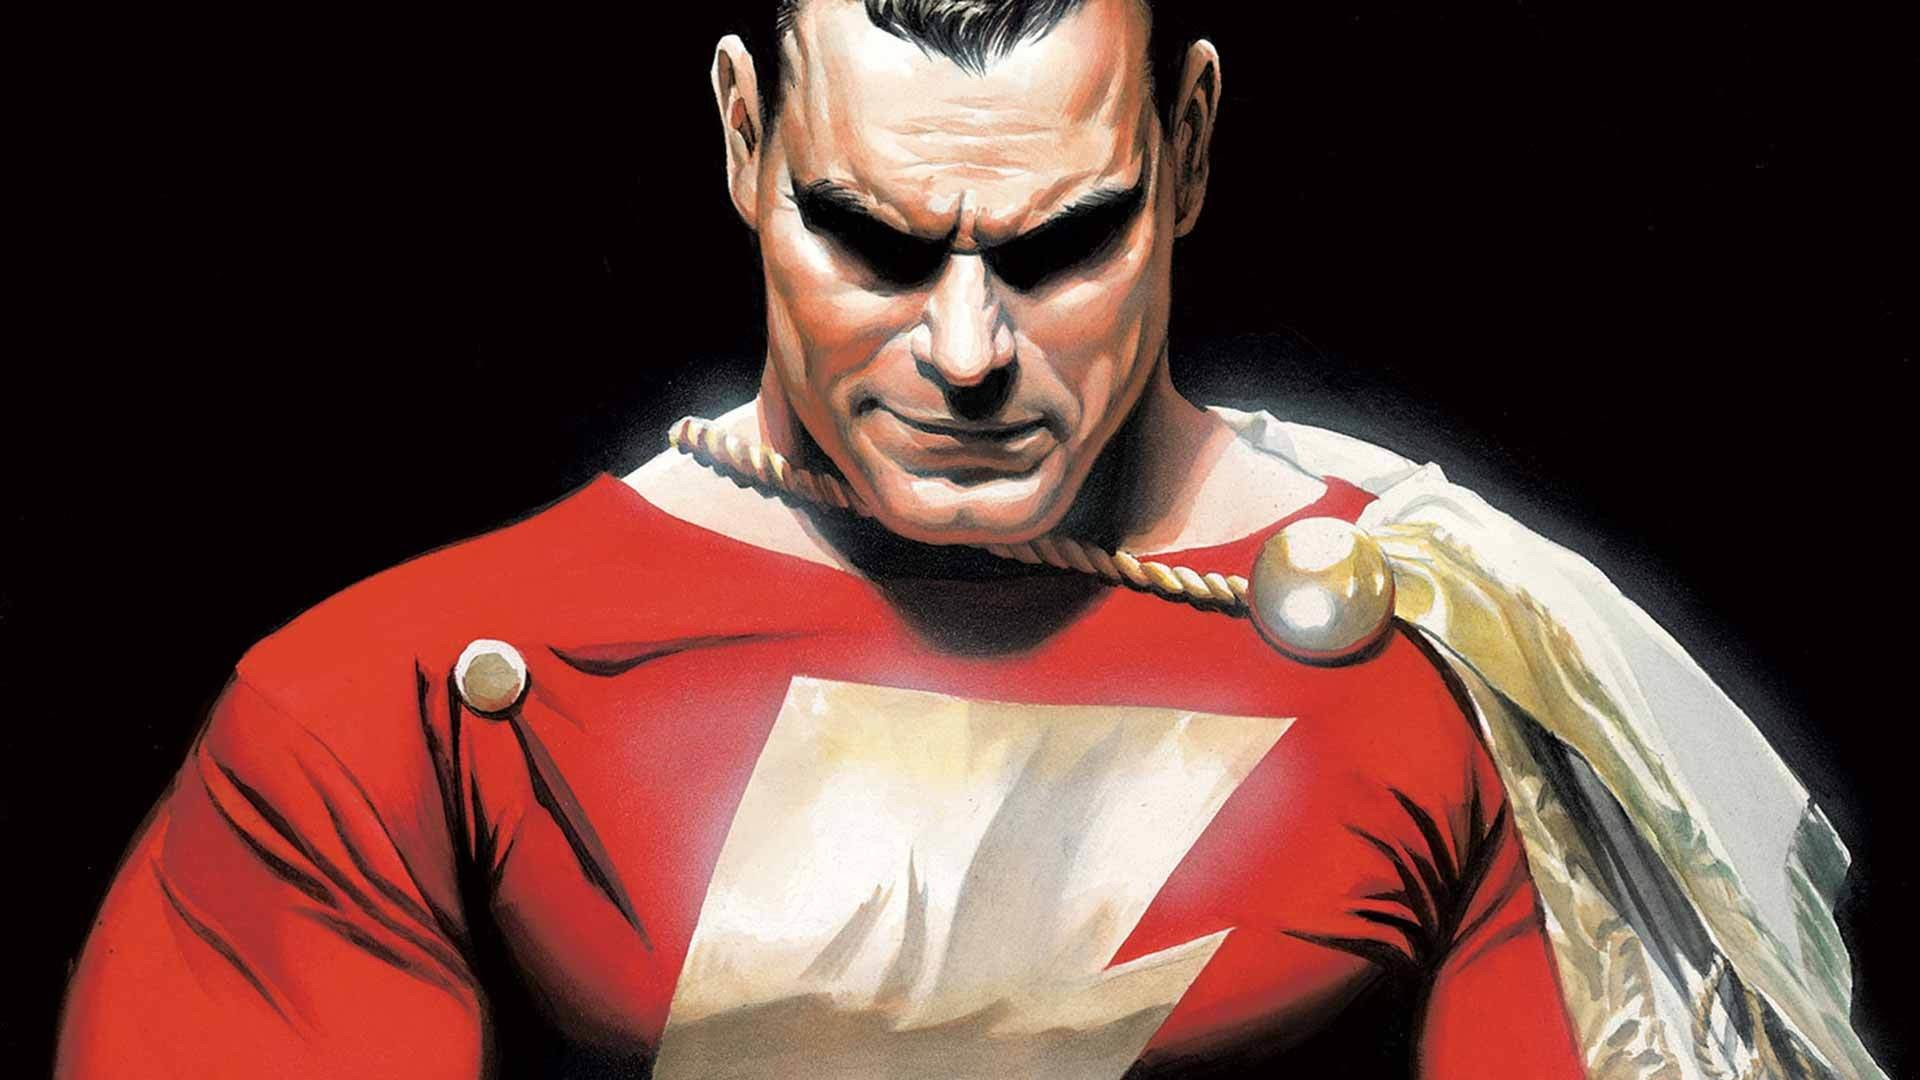 Res: 1920x1080, Superhero DC Captain Marvel (Shazam) Captain Marvel (Billy Batson) 1080p HD  Wallpaper